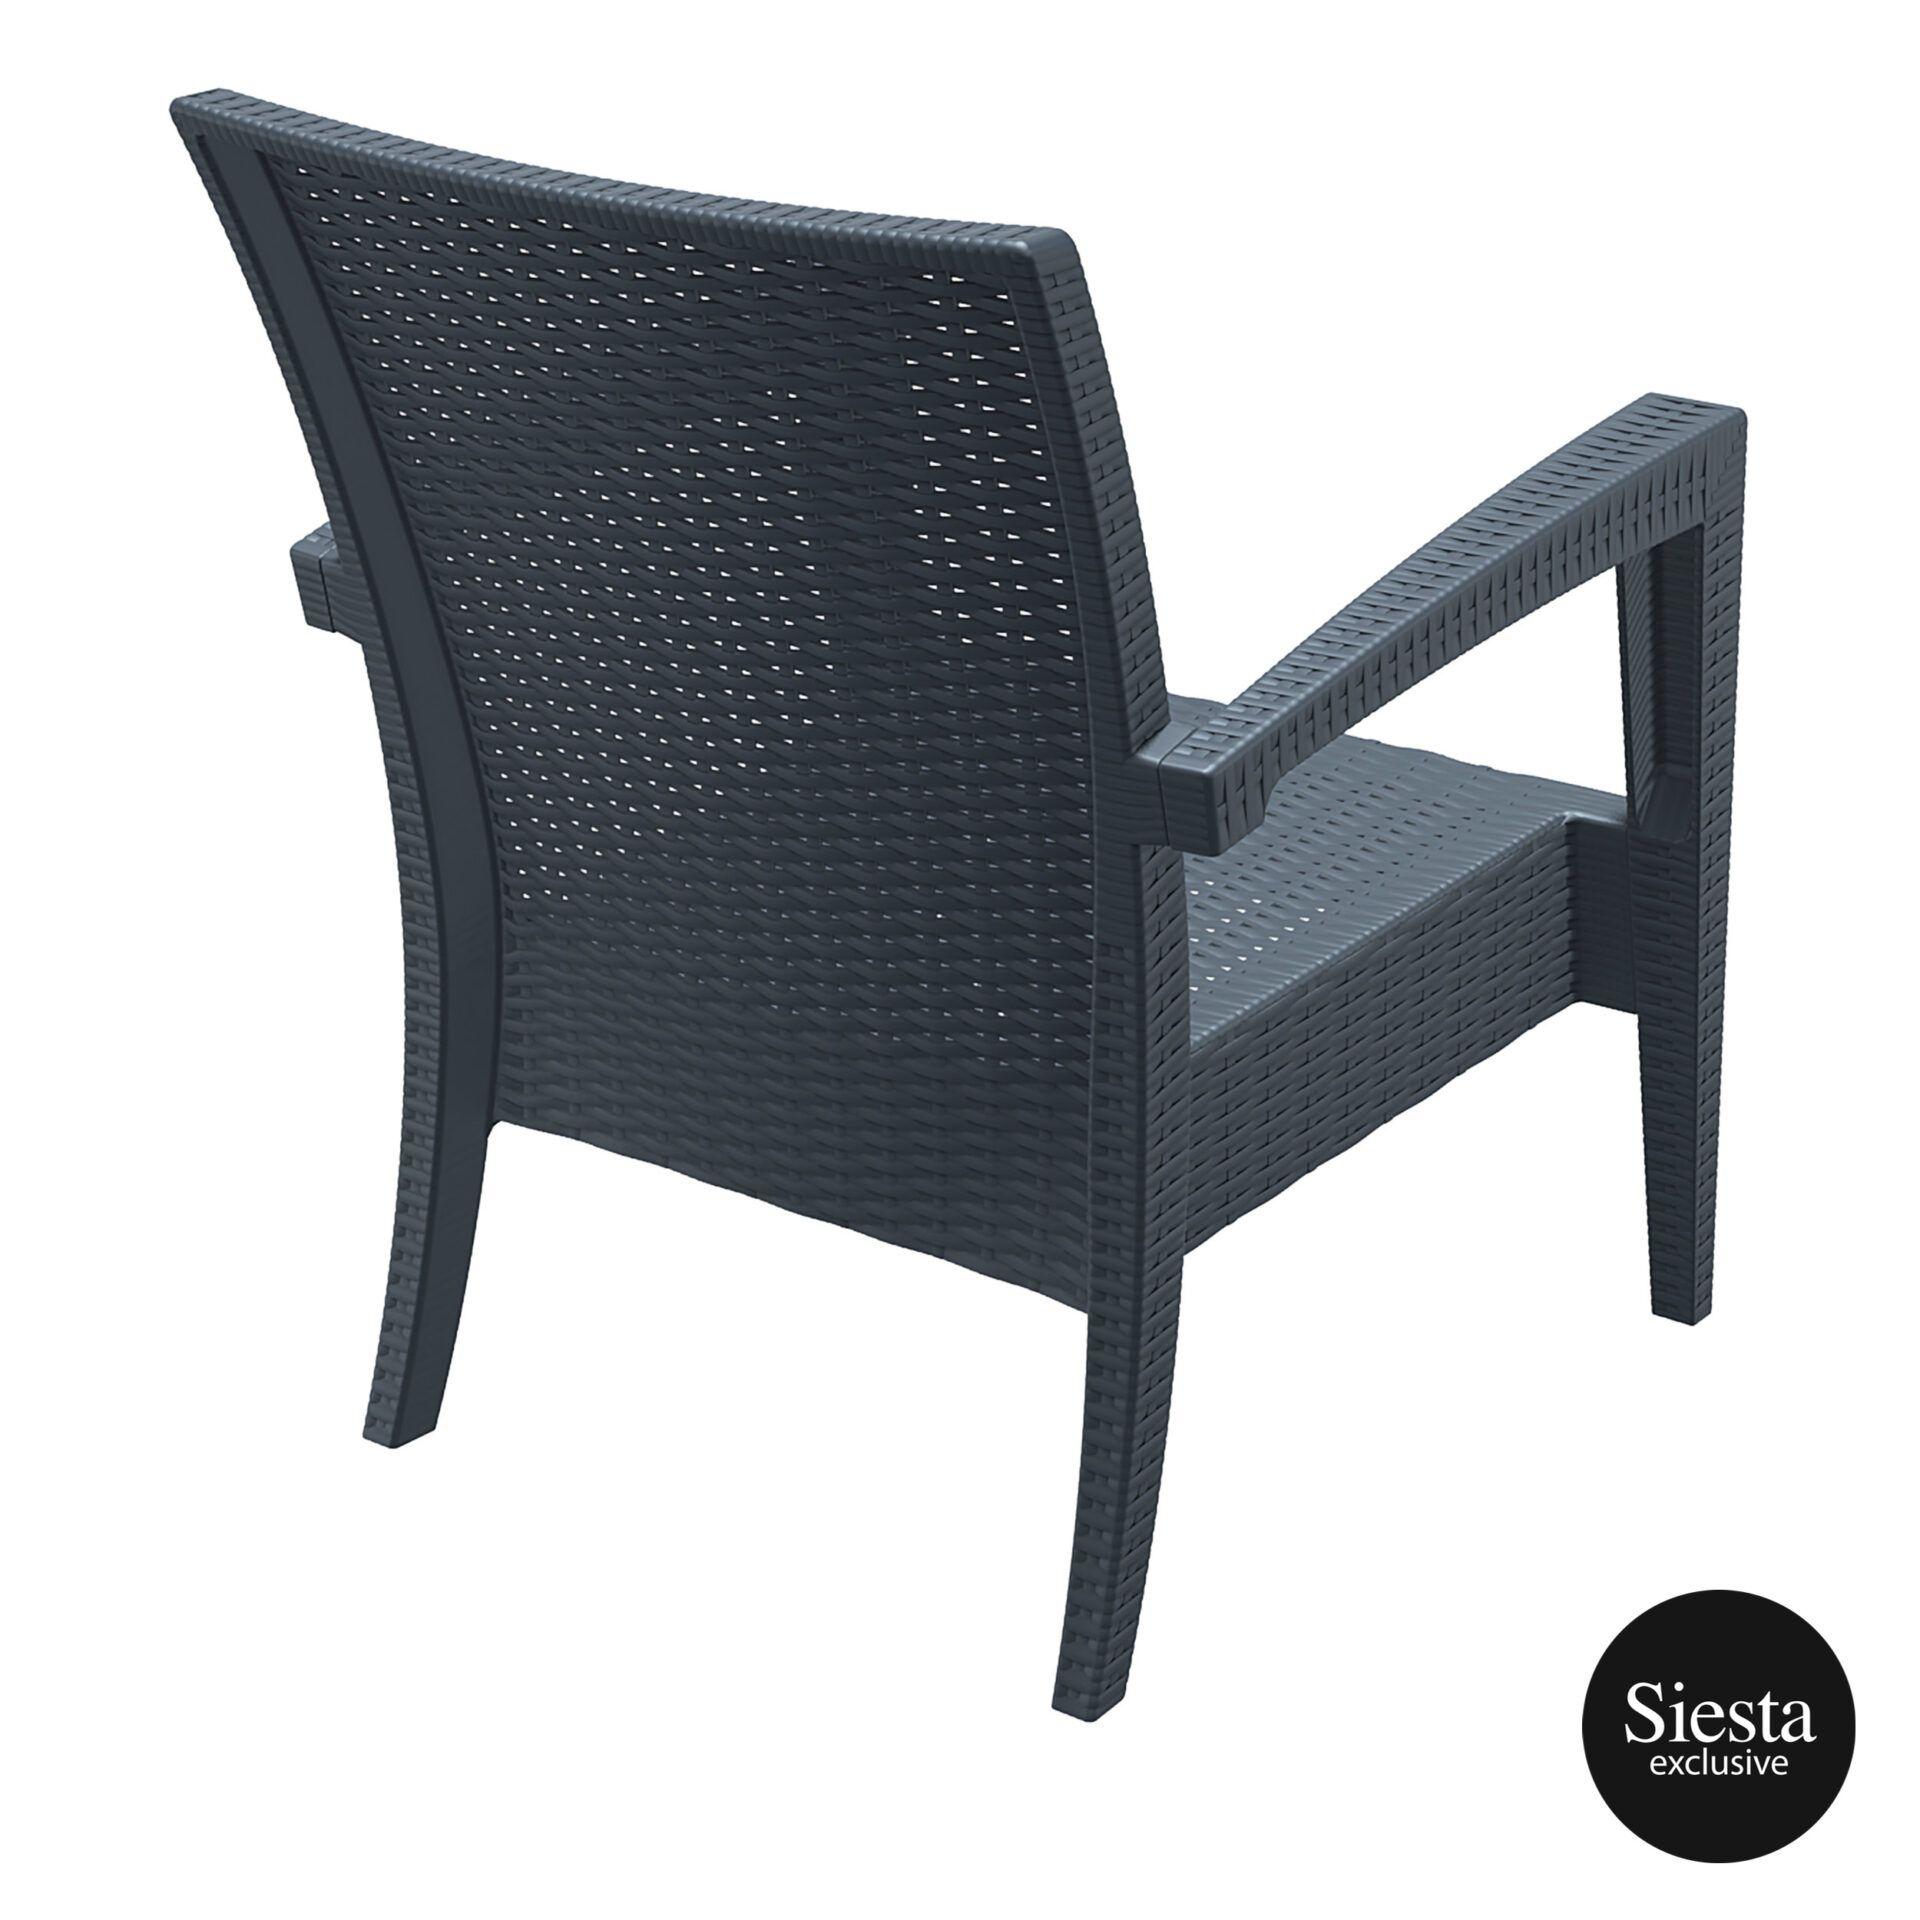 Resin Rattan Miami Tequila Lounge armchair darkgrey back side